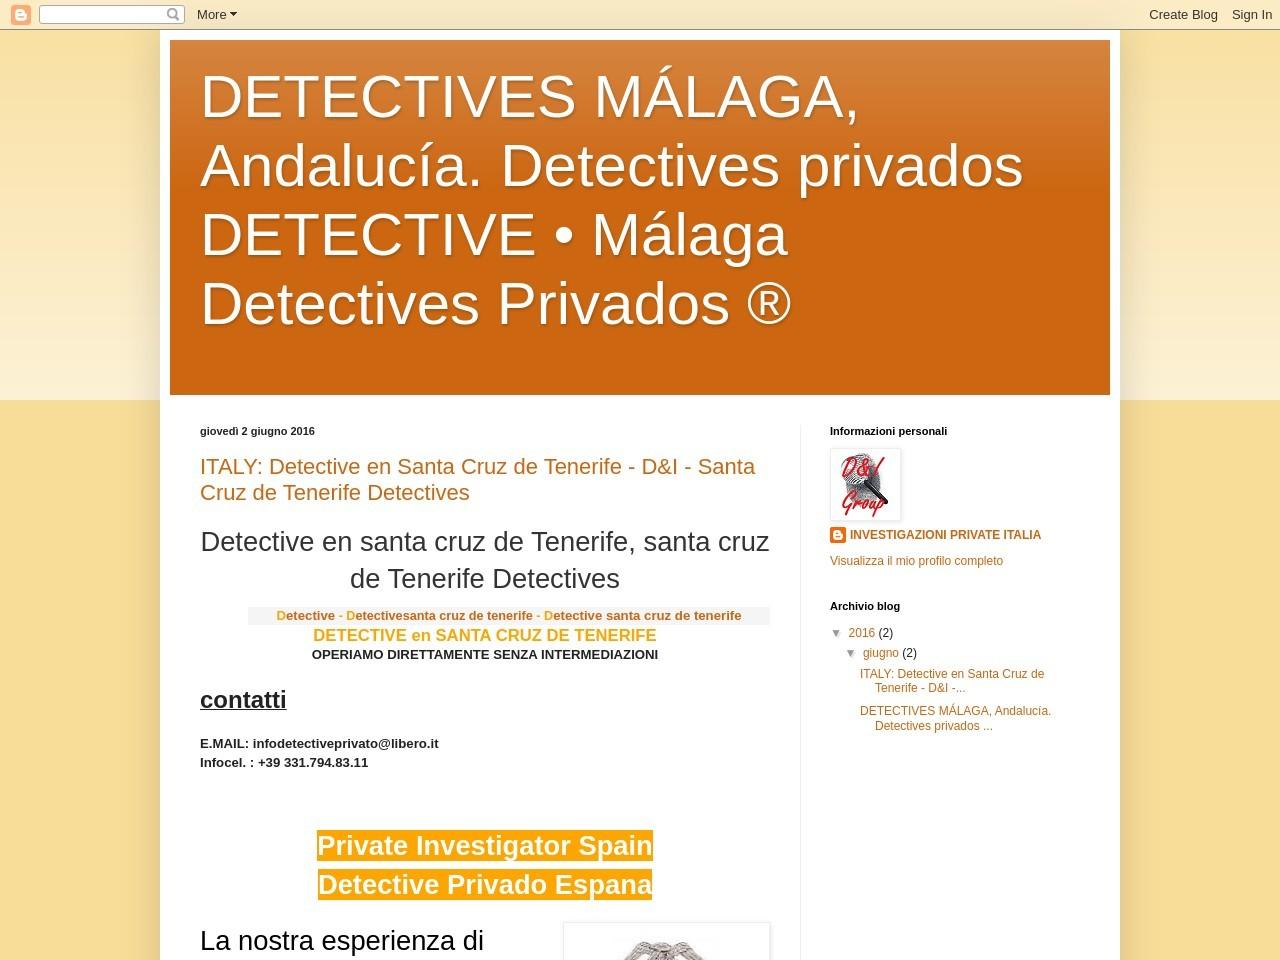 detectives-malaga-andalucia-detectives-privados-detective-%e2%80%a2-malaga-detectives-privados